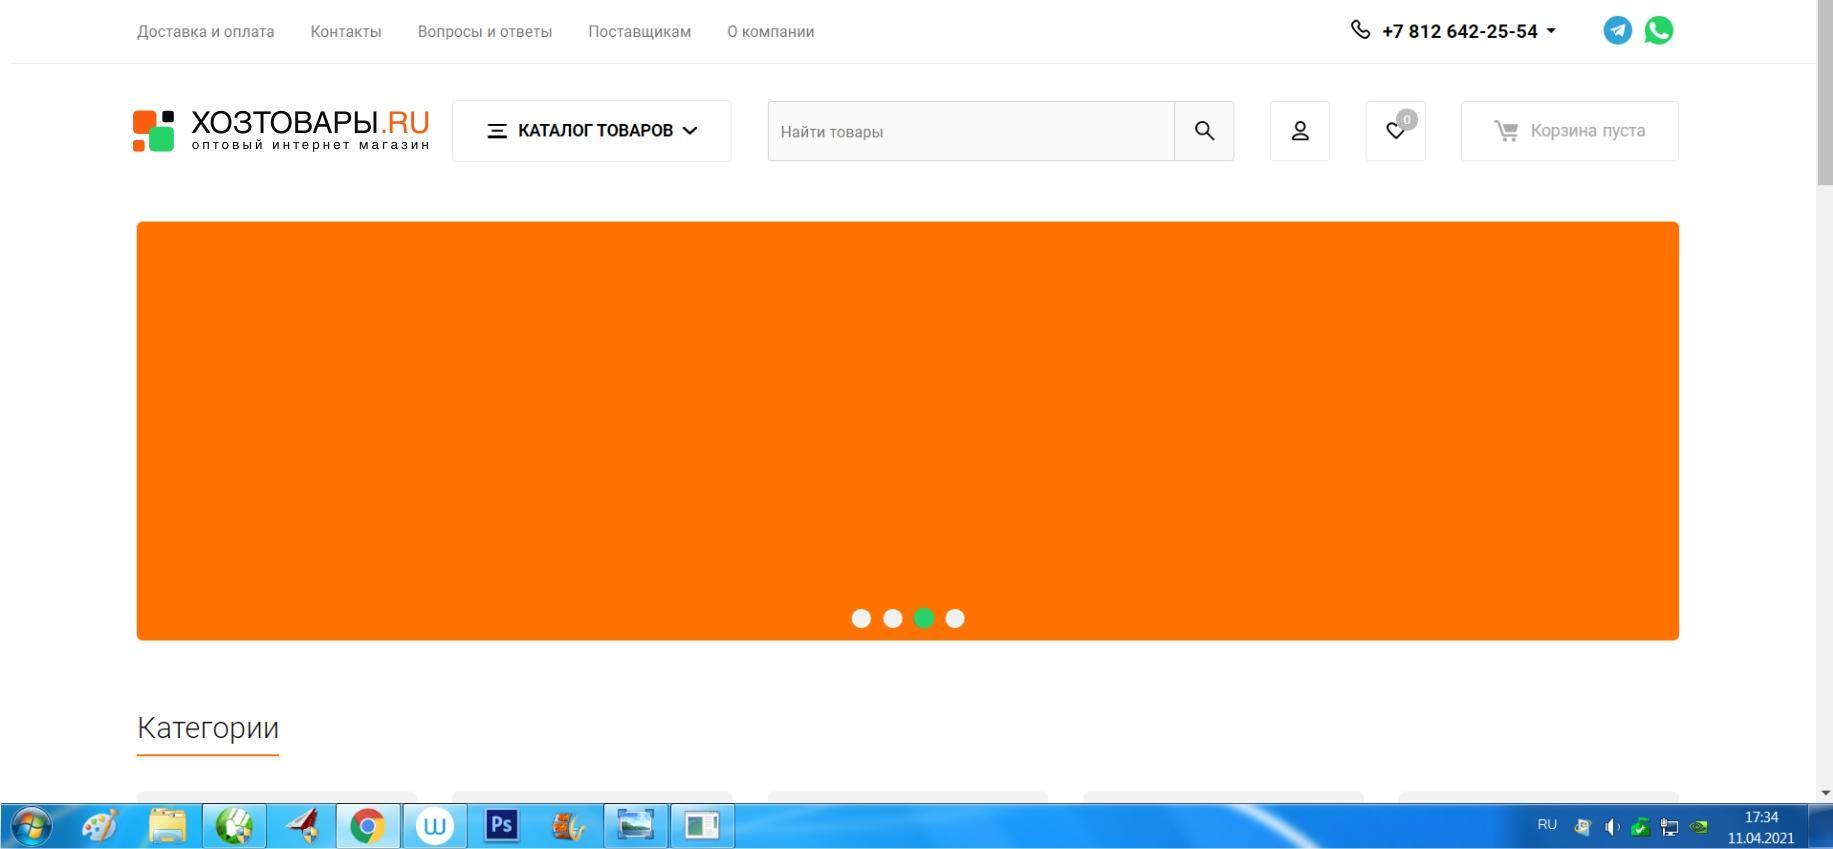 Разработка логотипа для оптового интернет-магазина «Хозтовары.ру» фото f_2616072f5732a7f0.jpg